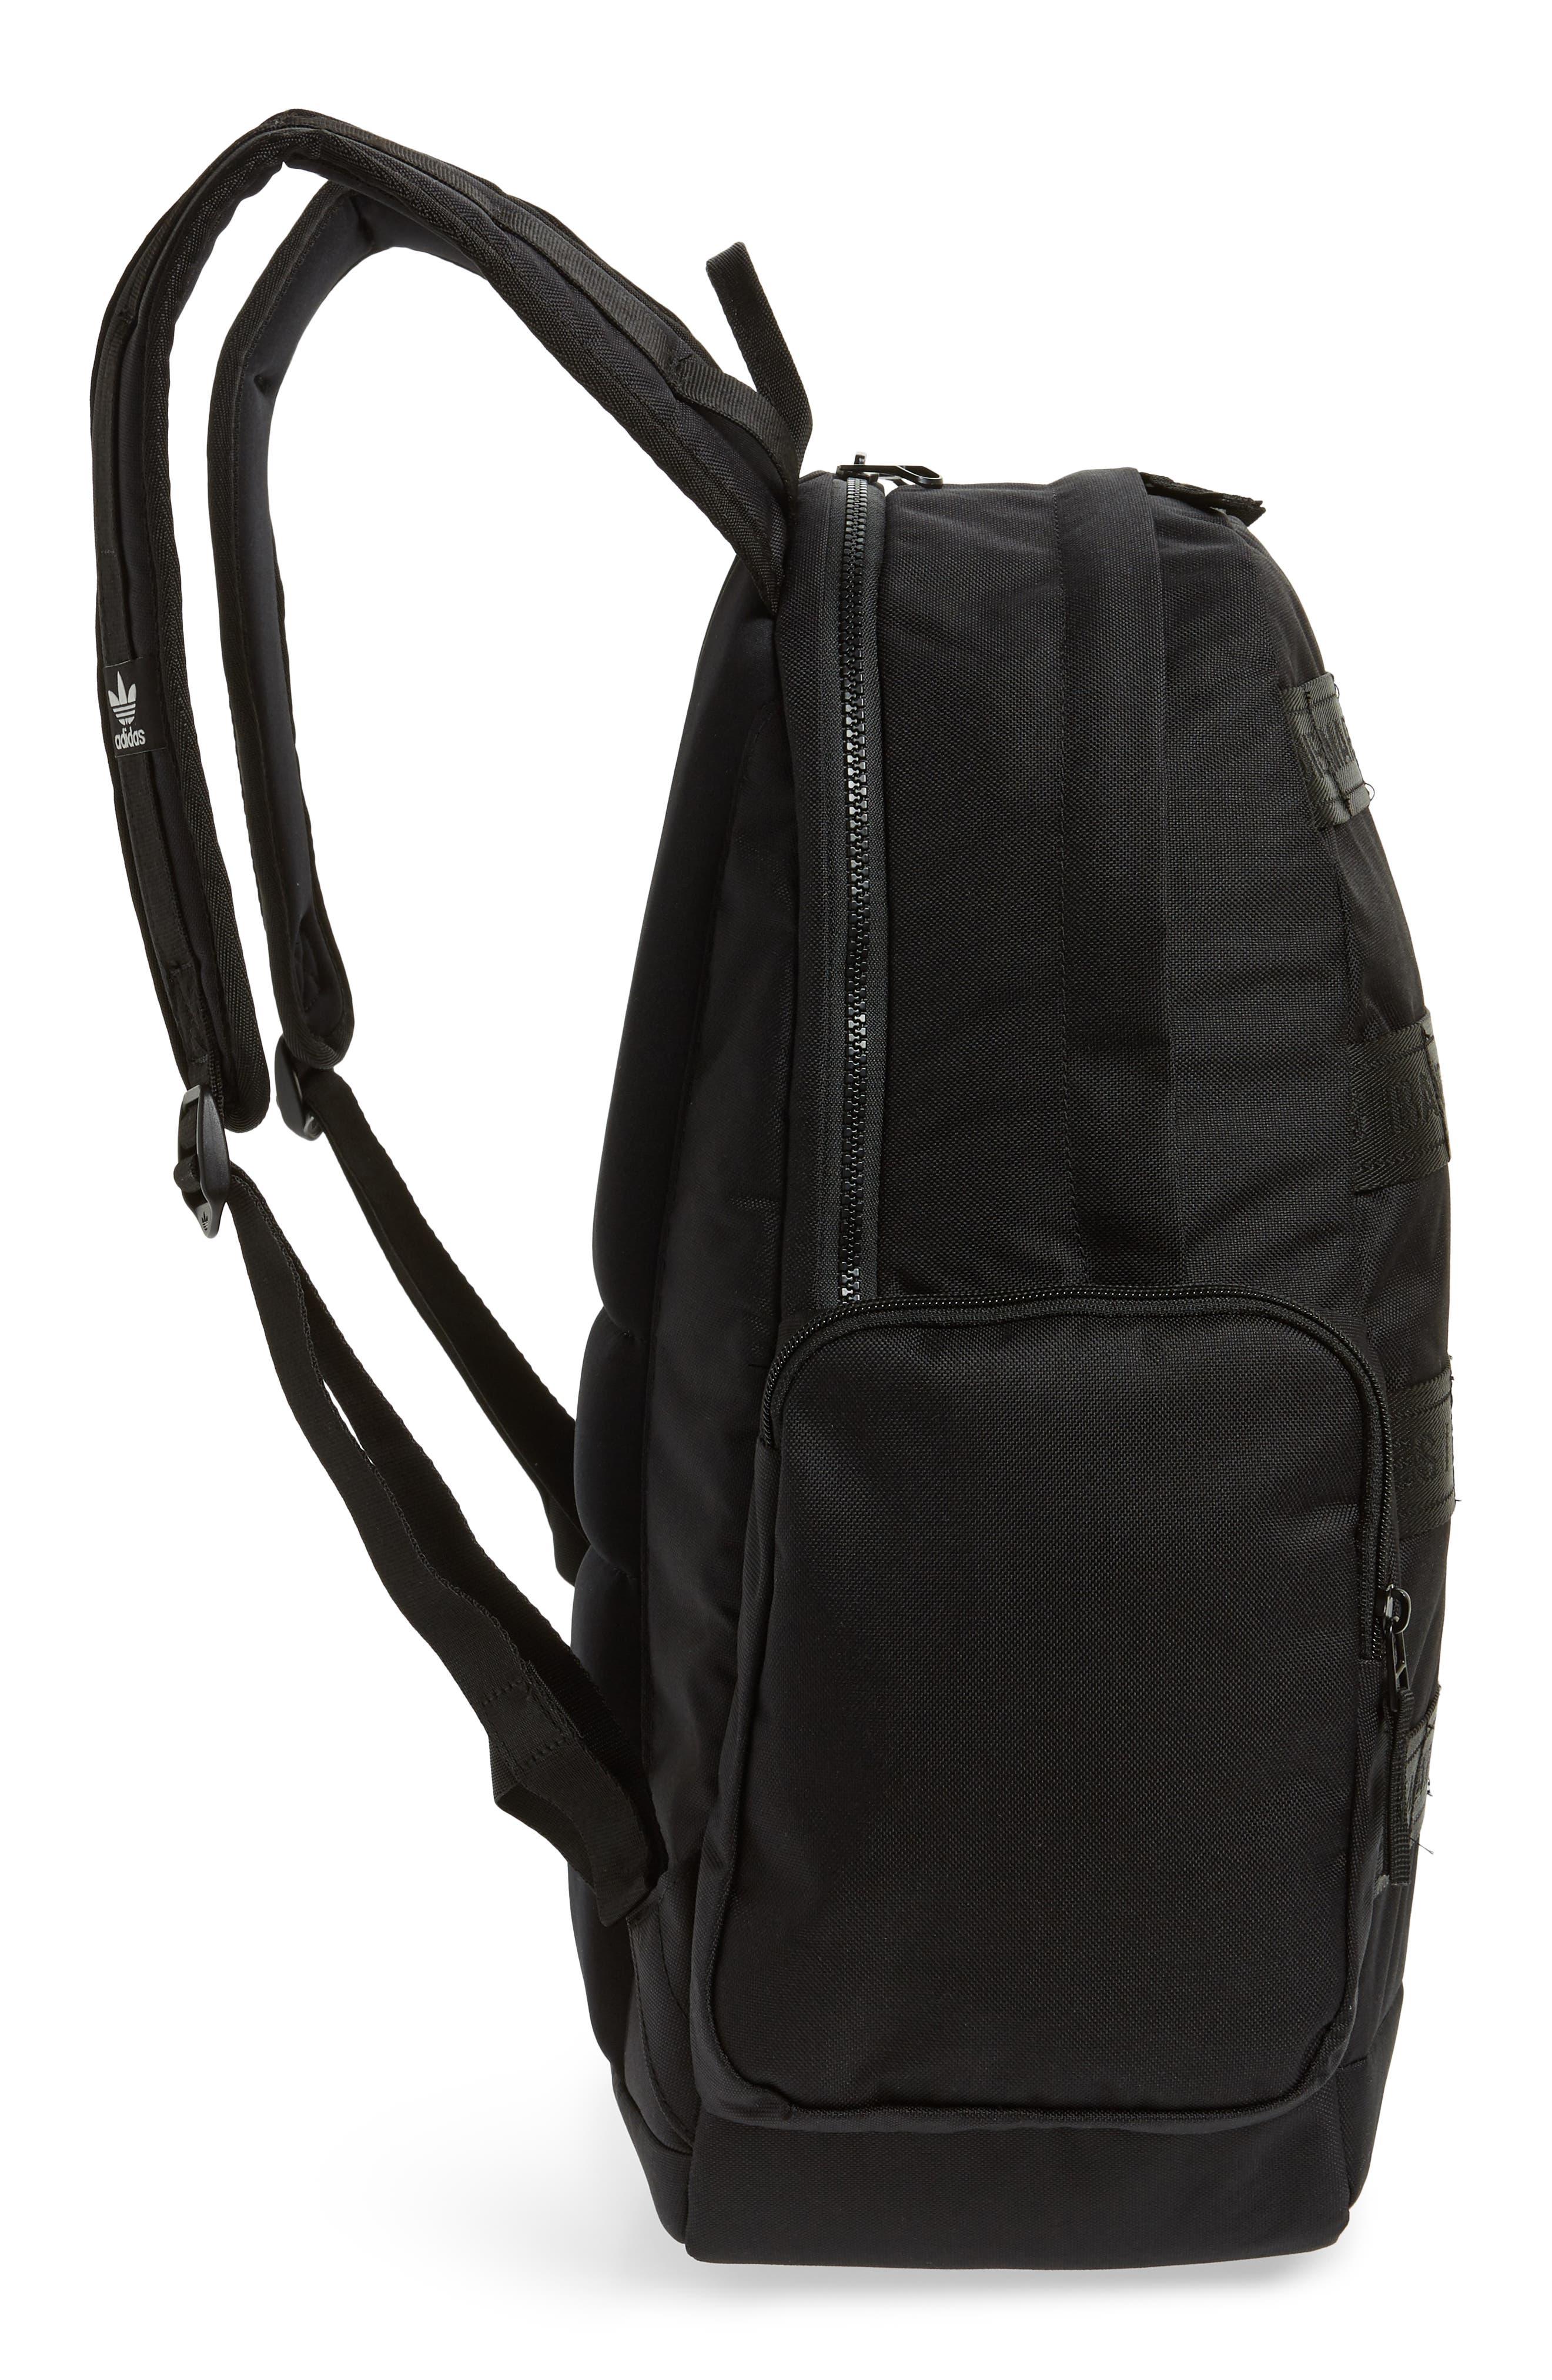 Create III Backpack,                             Alternate thumbnail 5, color,                             BLACK/ RAW DESERT KHAKI